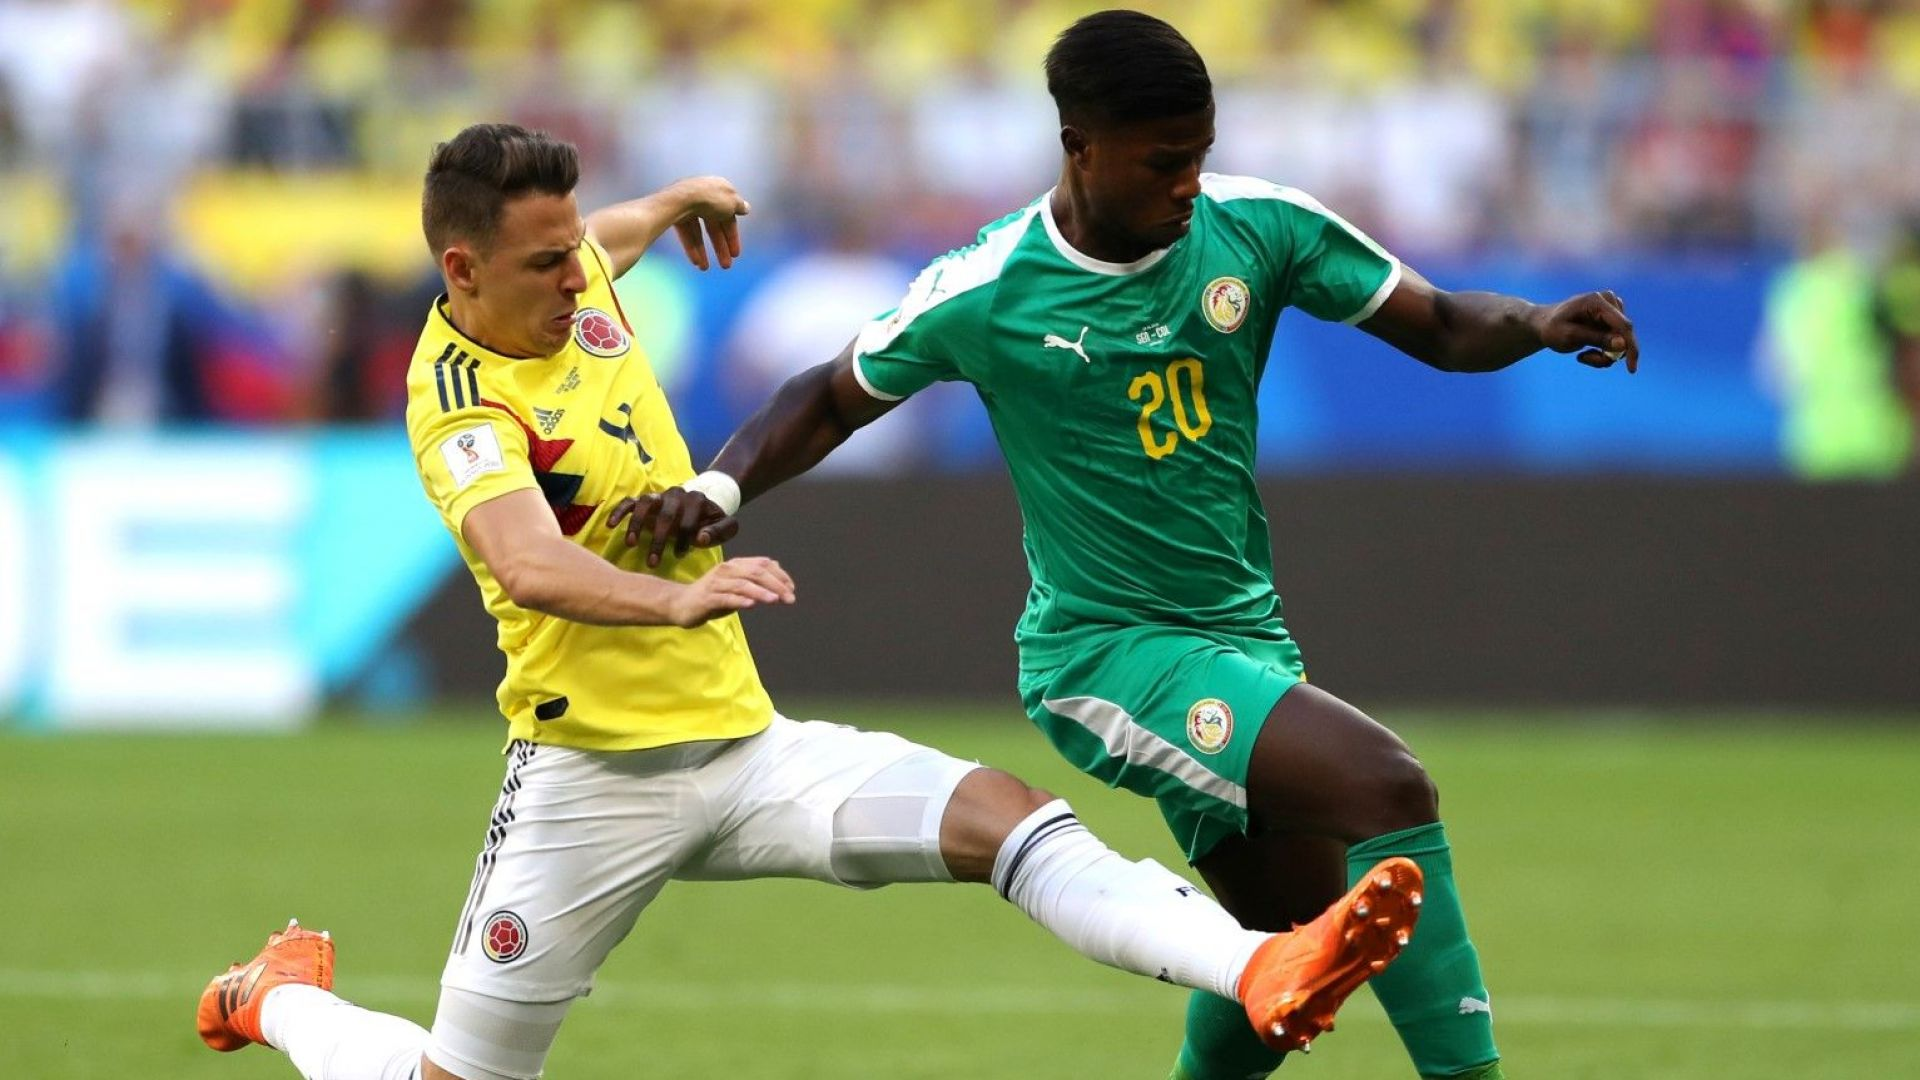 Сенегал - Колумбия 0:1 (статистика)